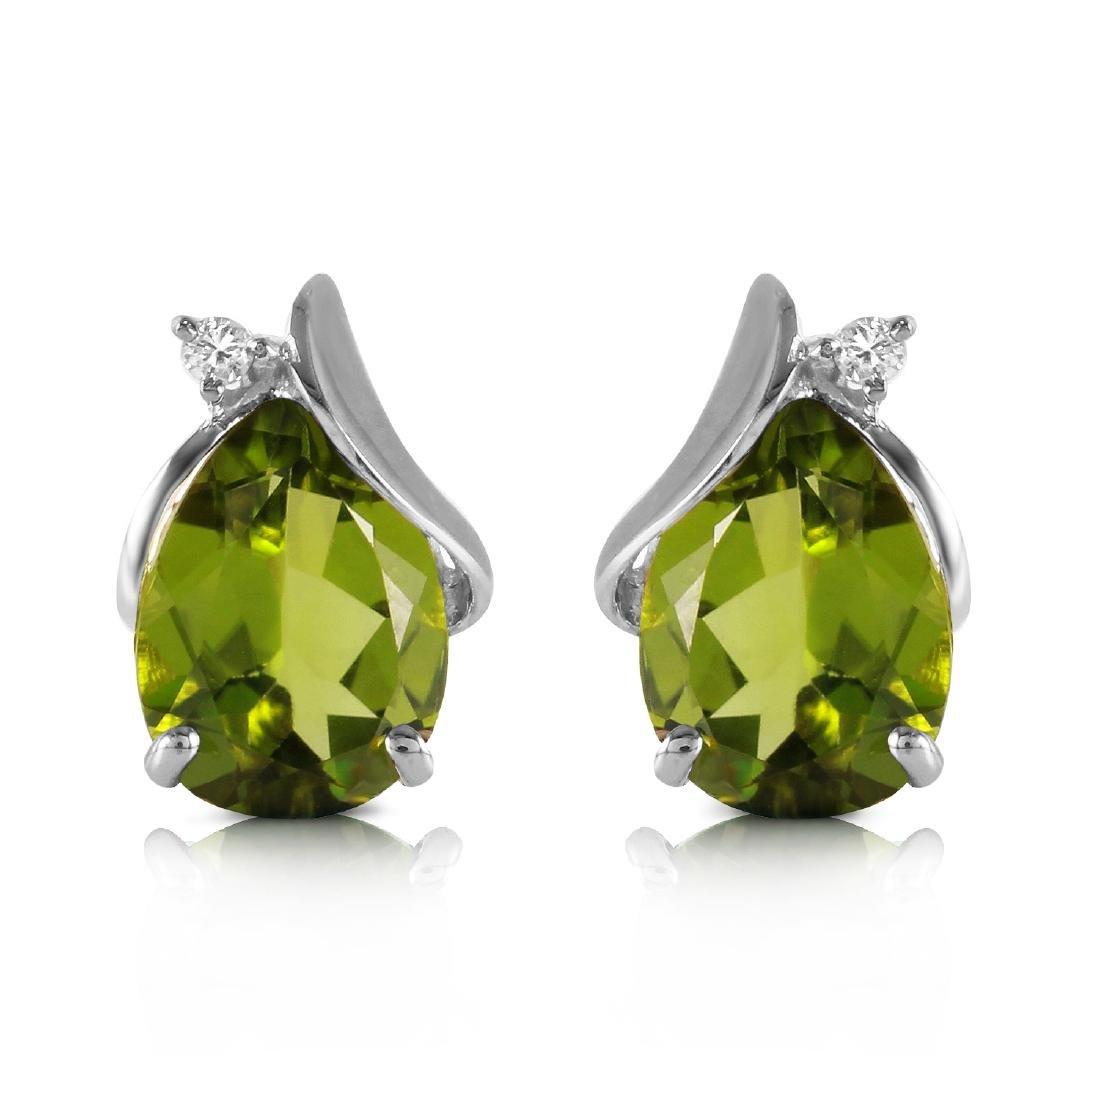 Genuine 4.26 ctw Peridot & Diamond Earrings Jewelry